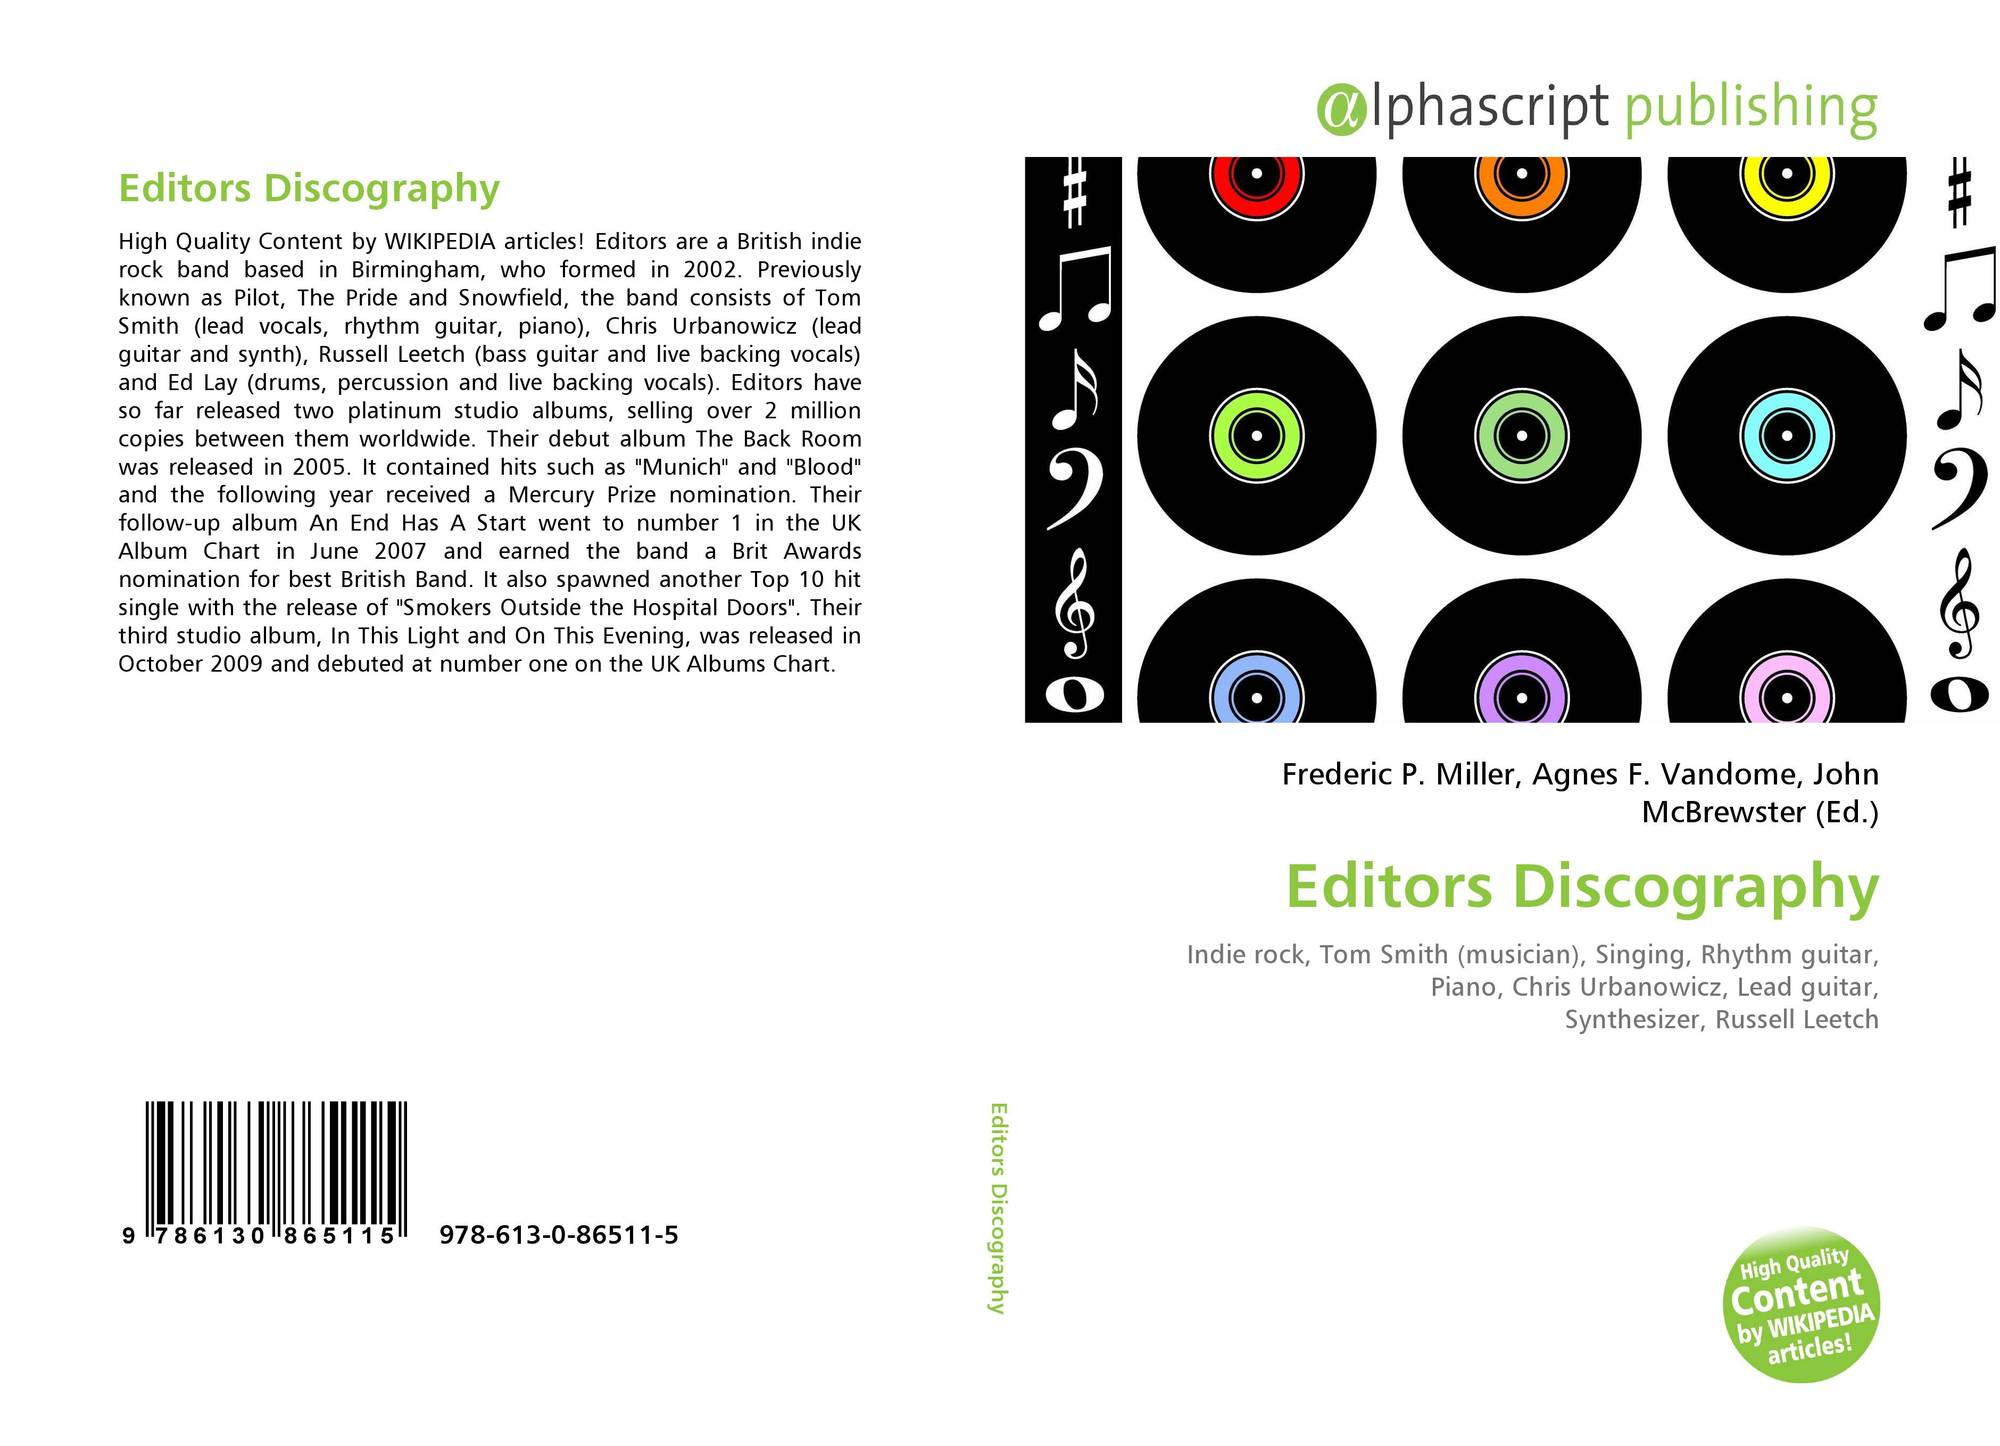 Editors Discography, 978-613-0-86511-5, 6130865112